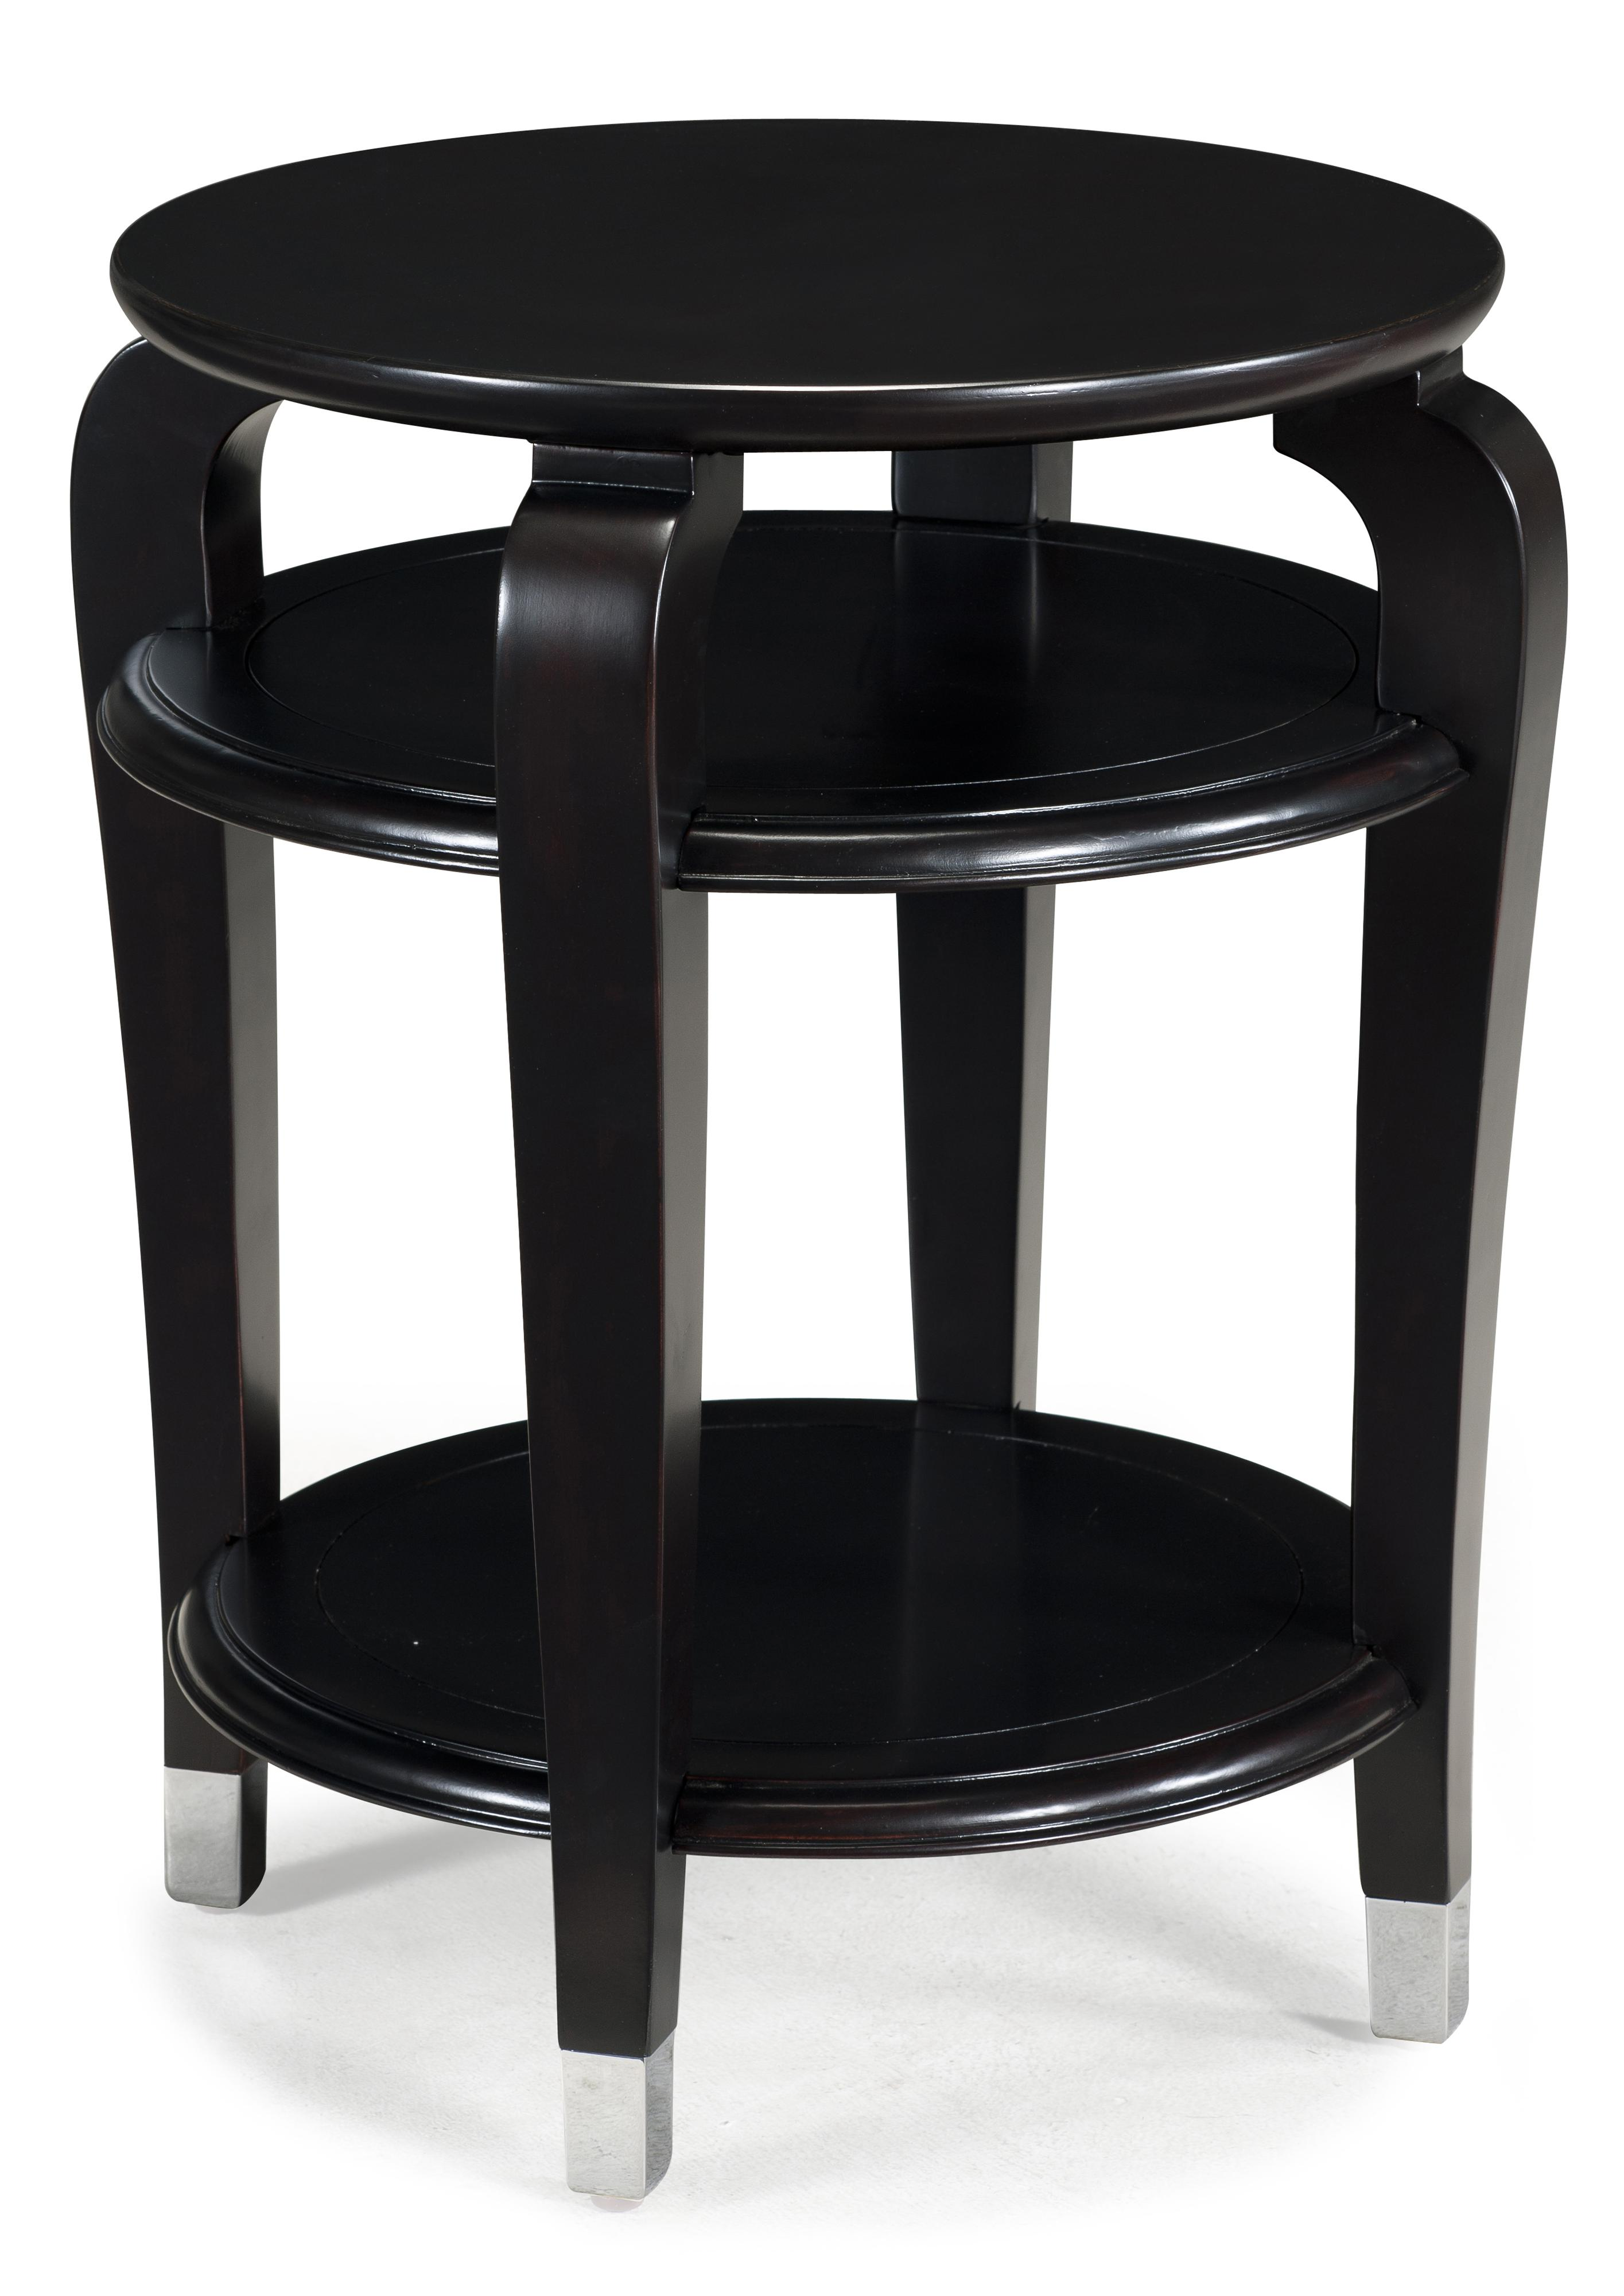 Magnussen Home Harper Round Accent Table - Item Number: T1946-35